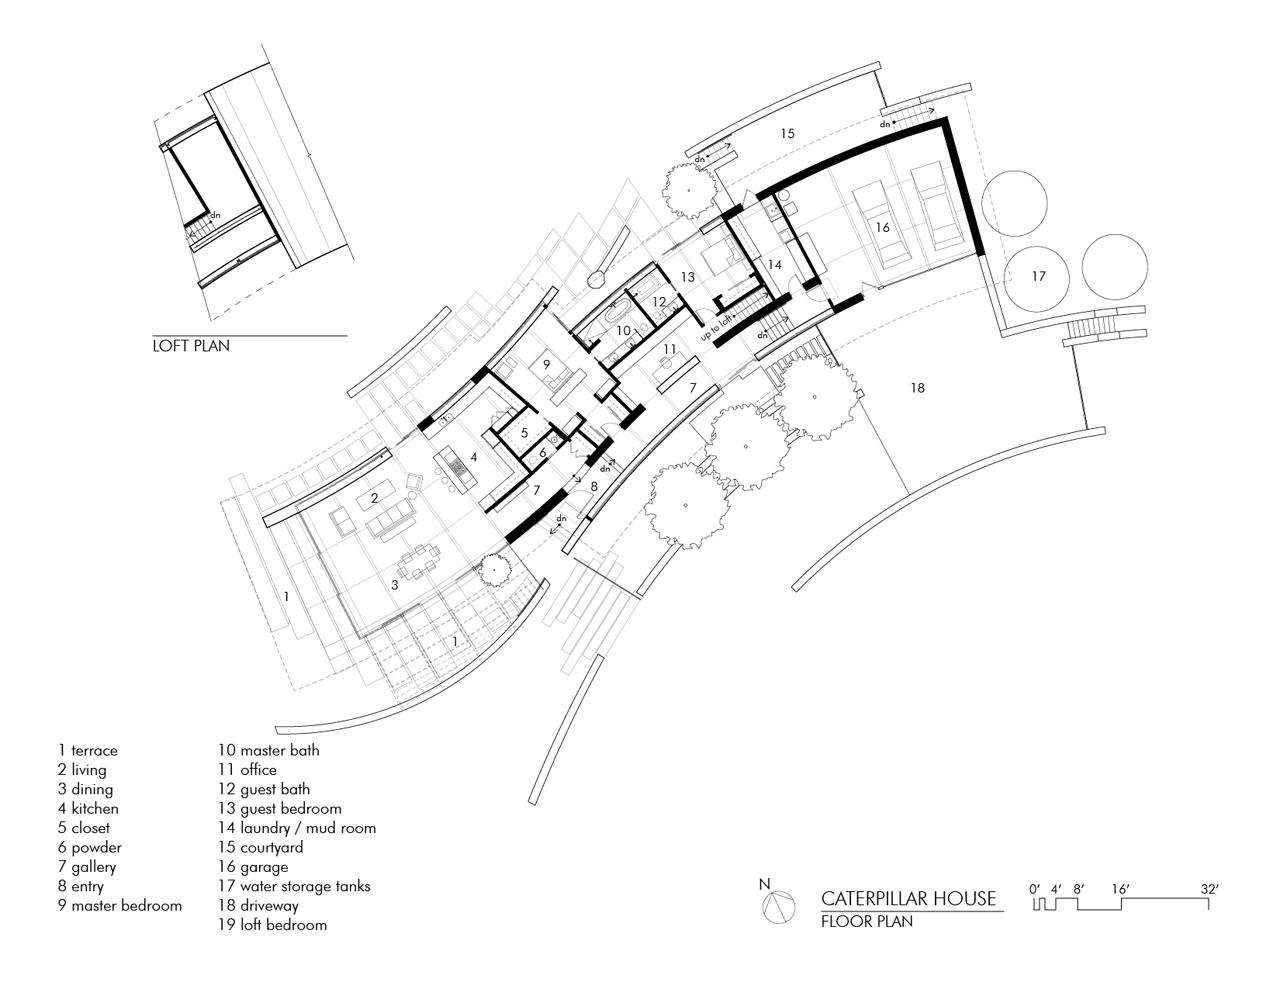 Floor Plan, Caterpillar House in Carmel, California by Feldman Architecture